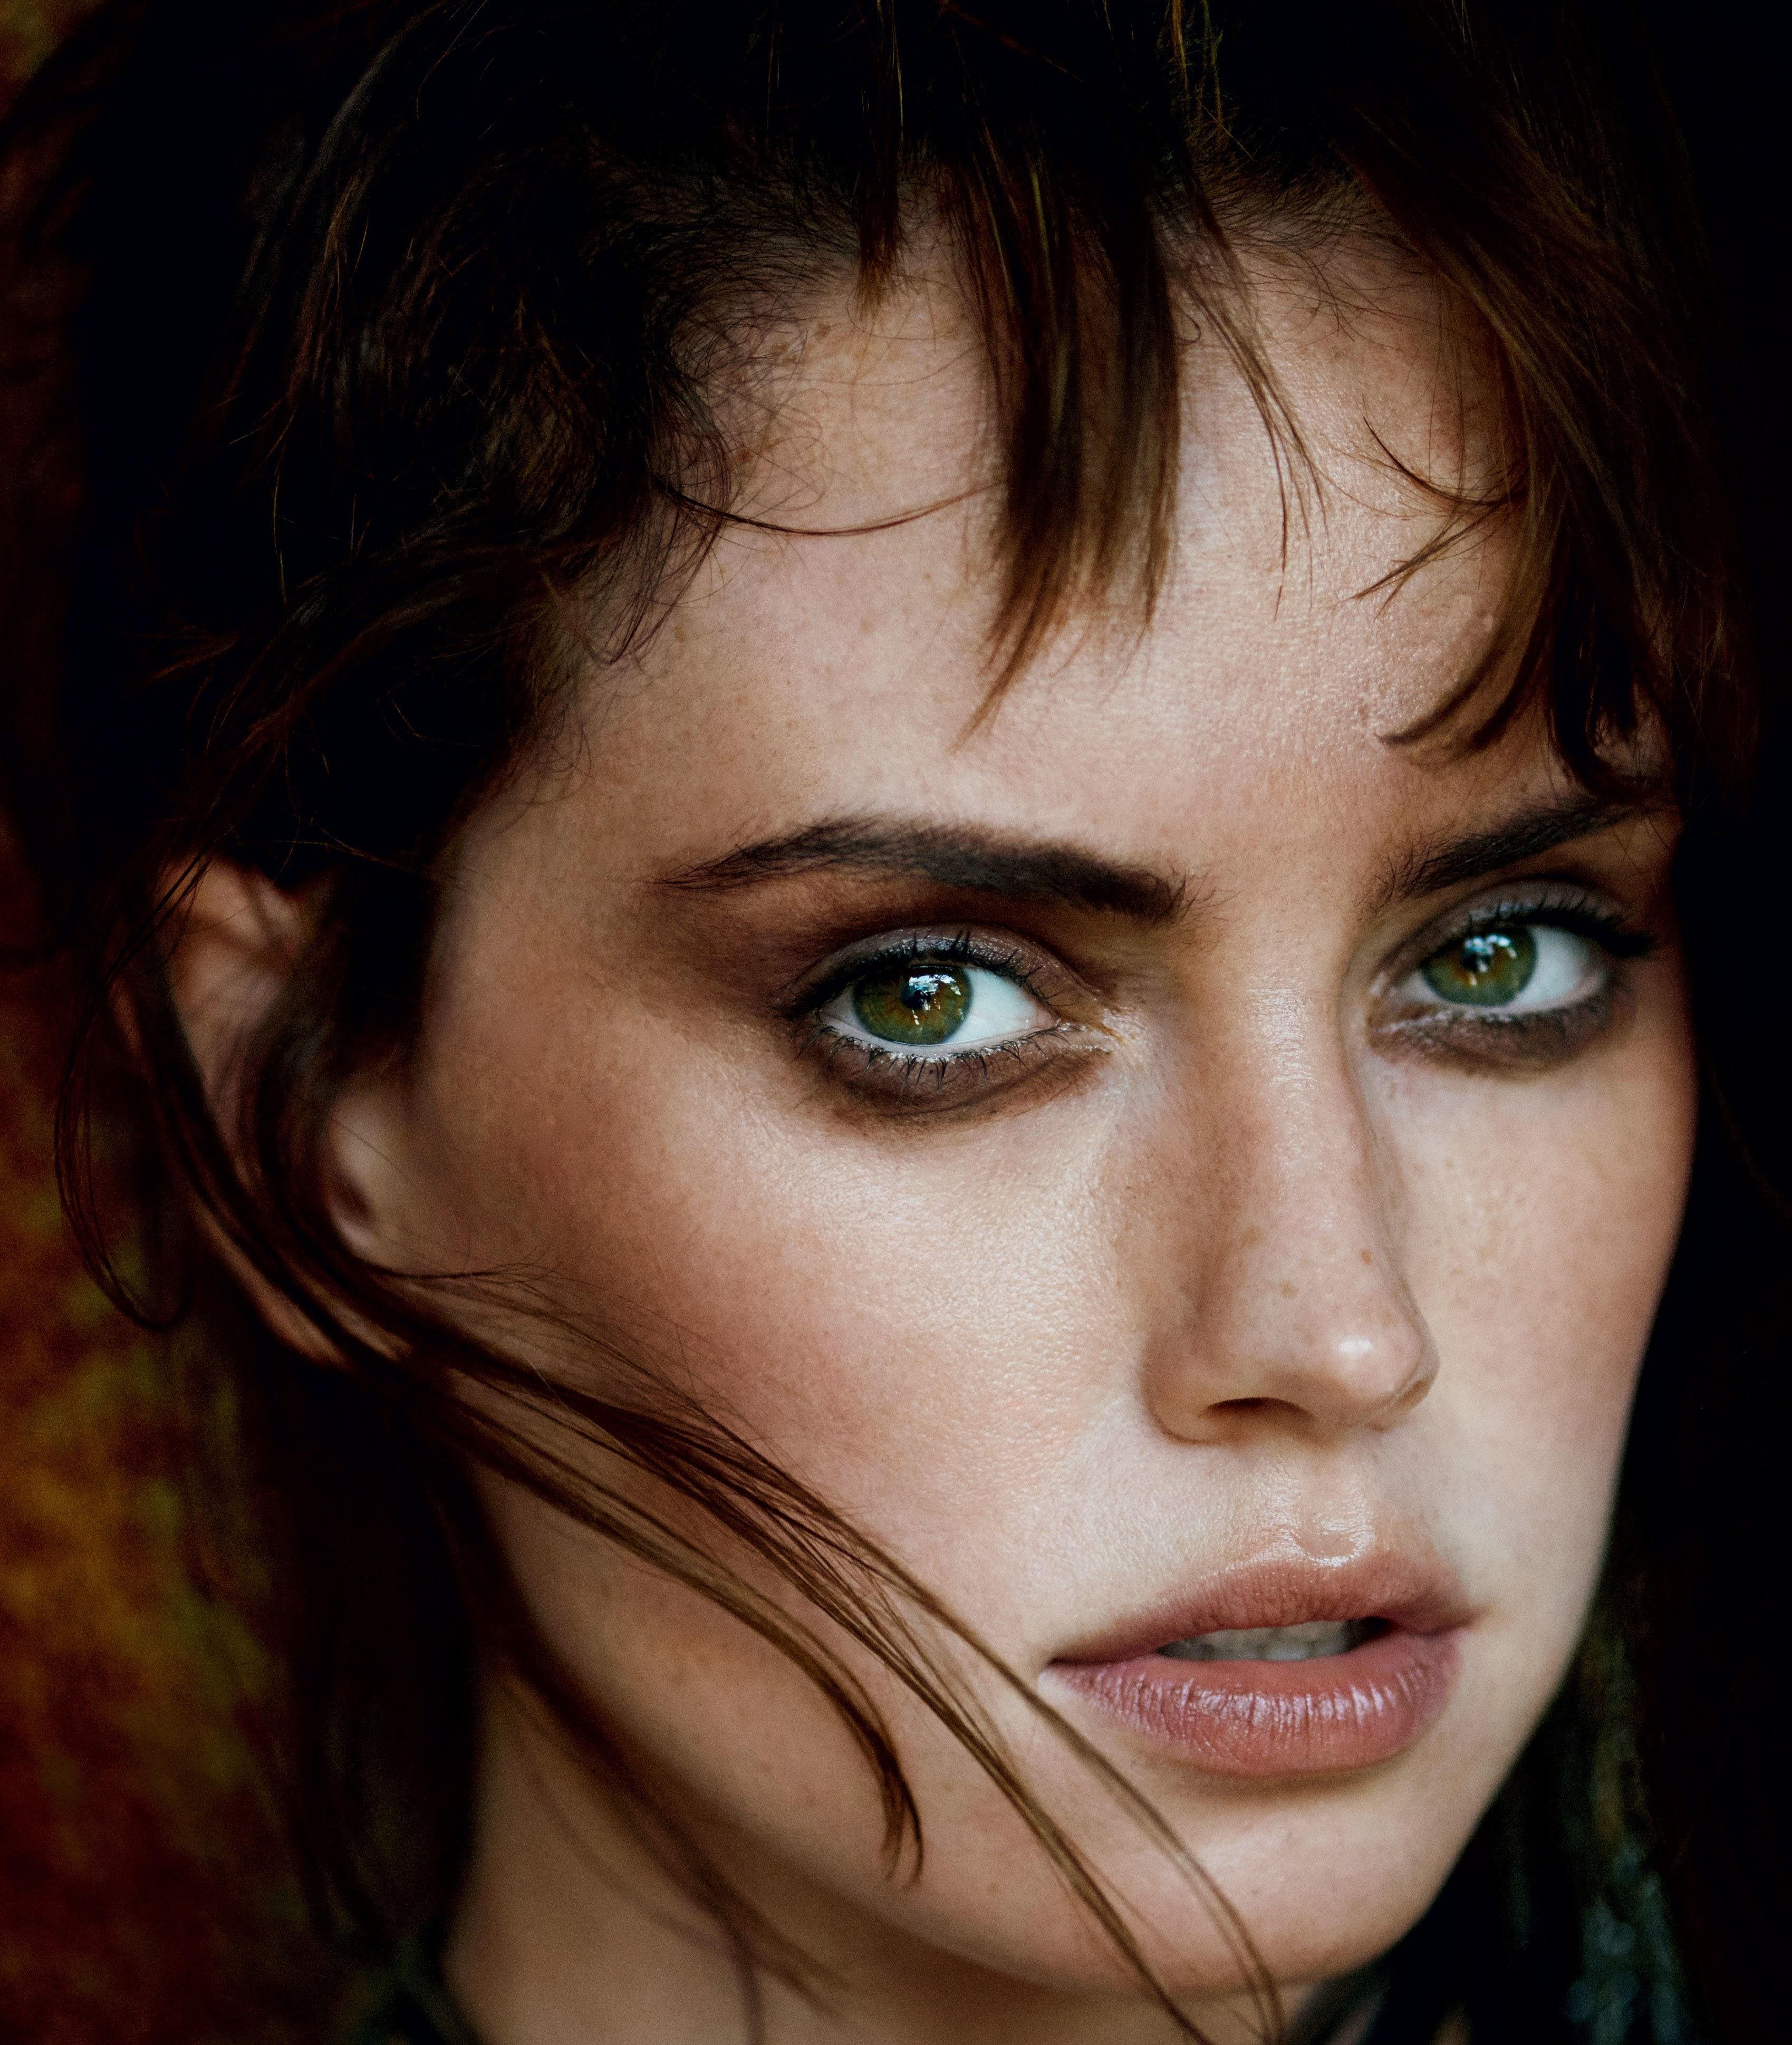 Daisy Ridley on Vogue :「スター・ウォーズ」と「オリエント急行殺人事件」の話題作2連発で注目の ...